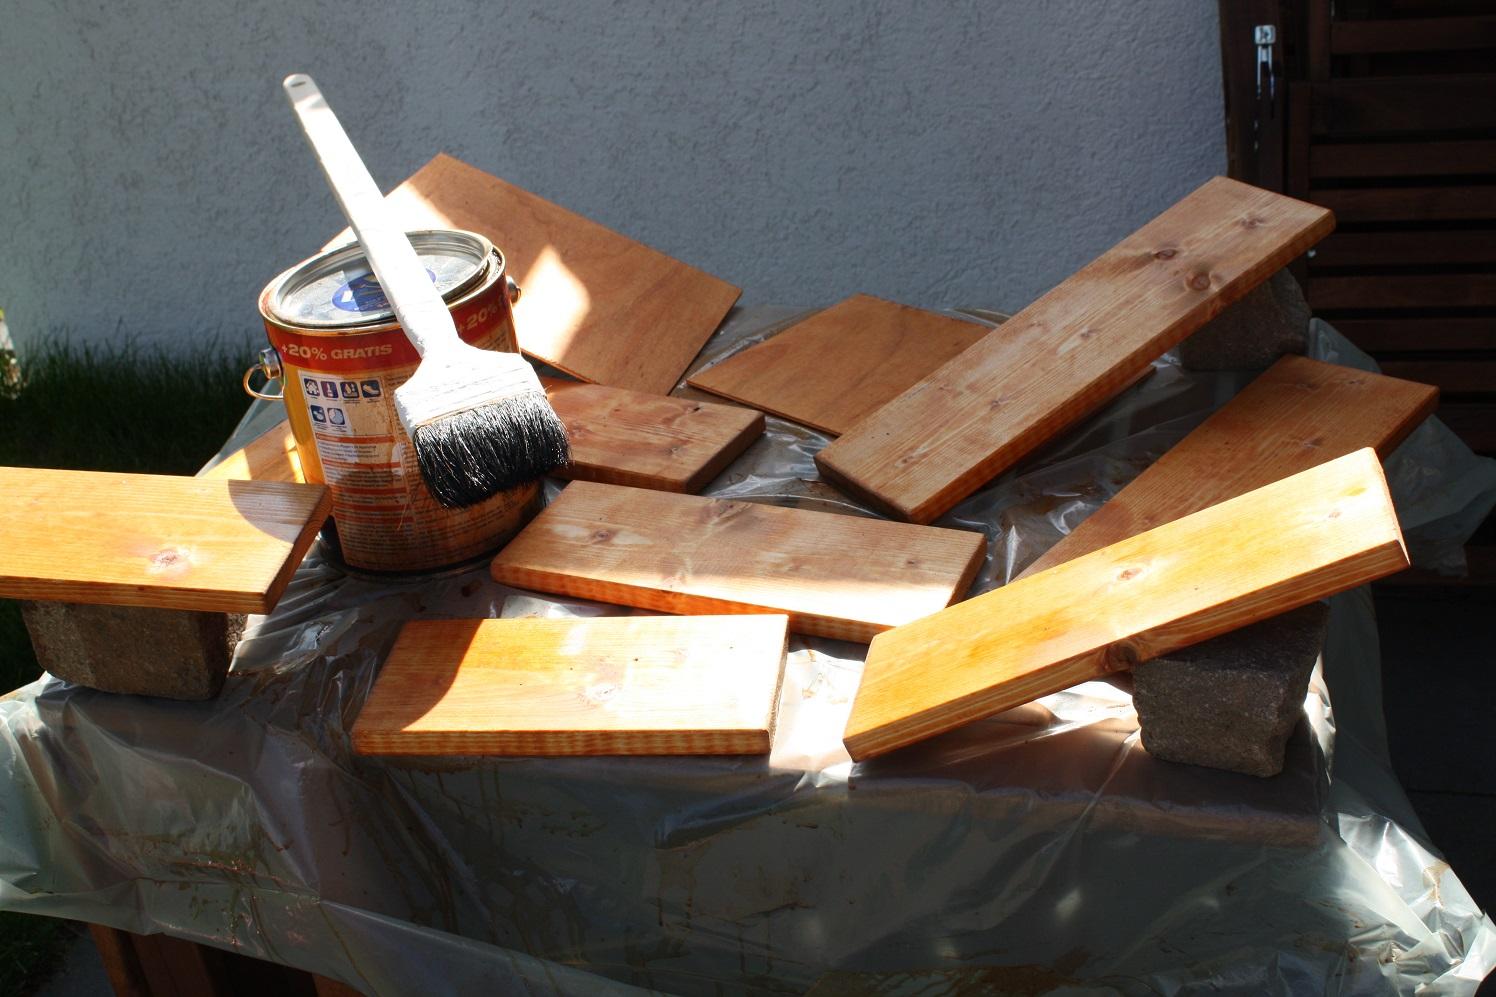 butternapf insektenhotel selber bauen f r unter 20 anleitung. Black Bedroom Furniture Sets. Home Design Ideas